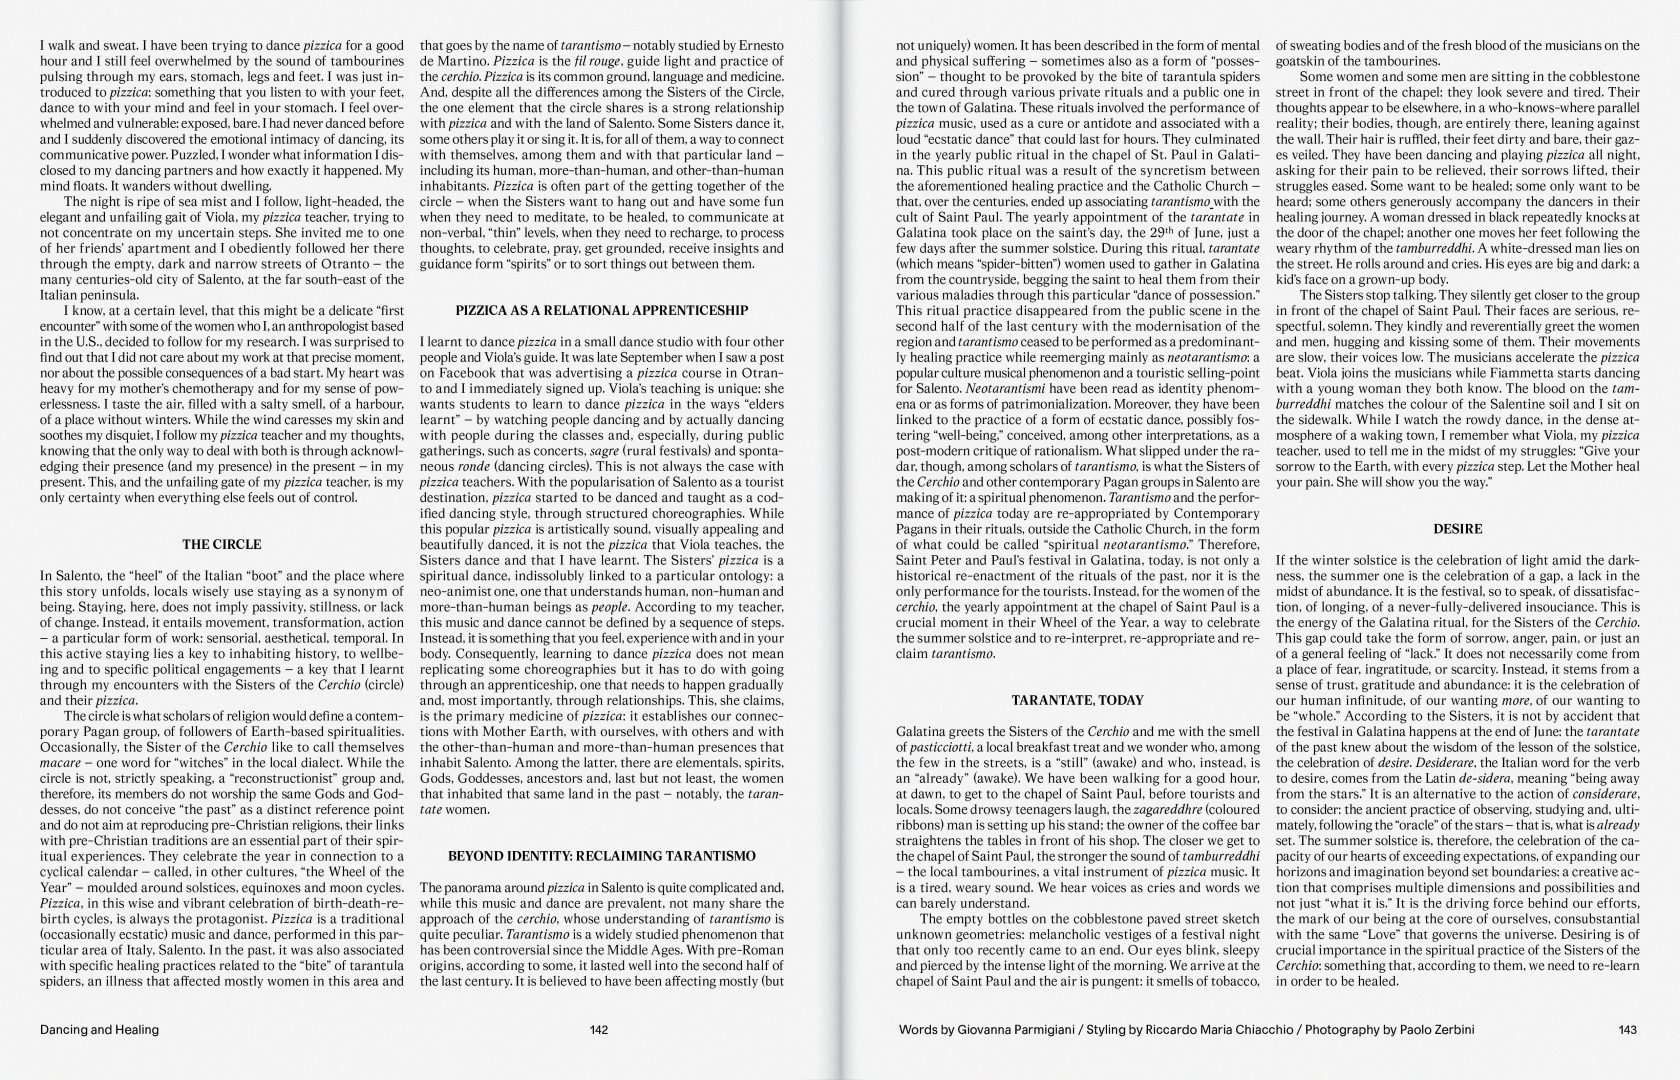 Sali e Tabacchi Journal N°01, Words by Giovanna Parmigiani